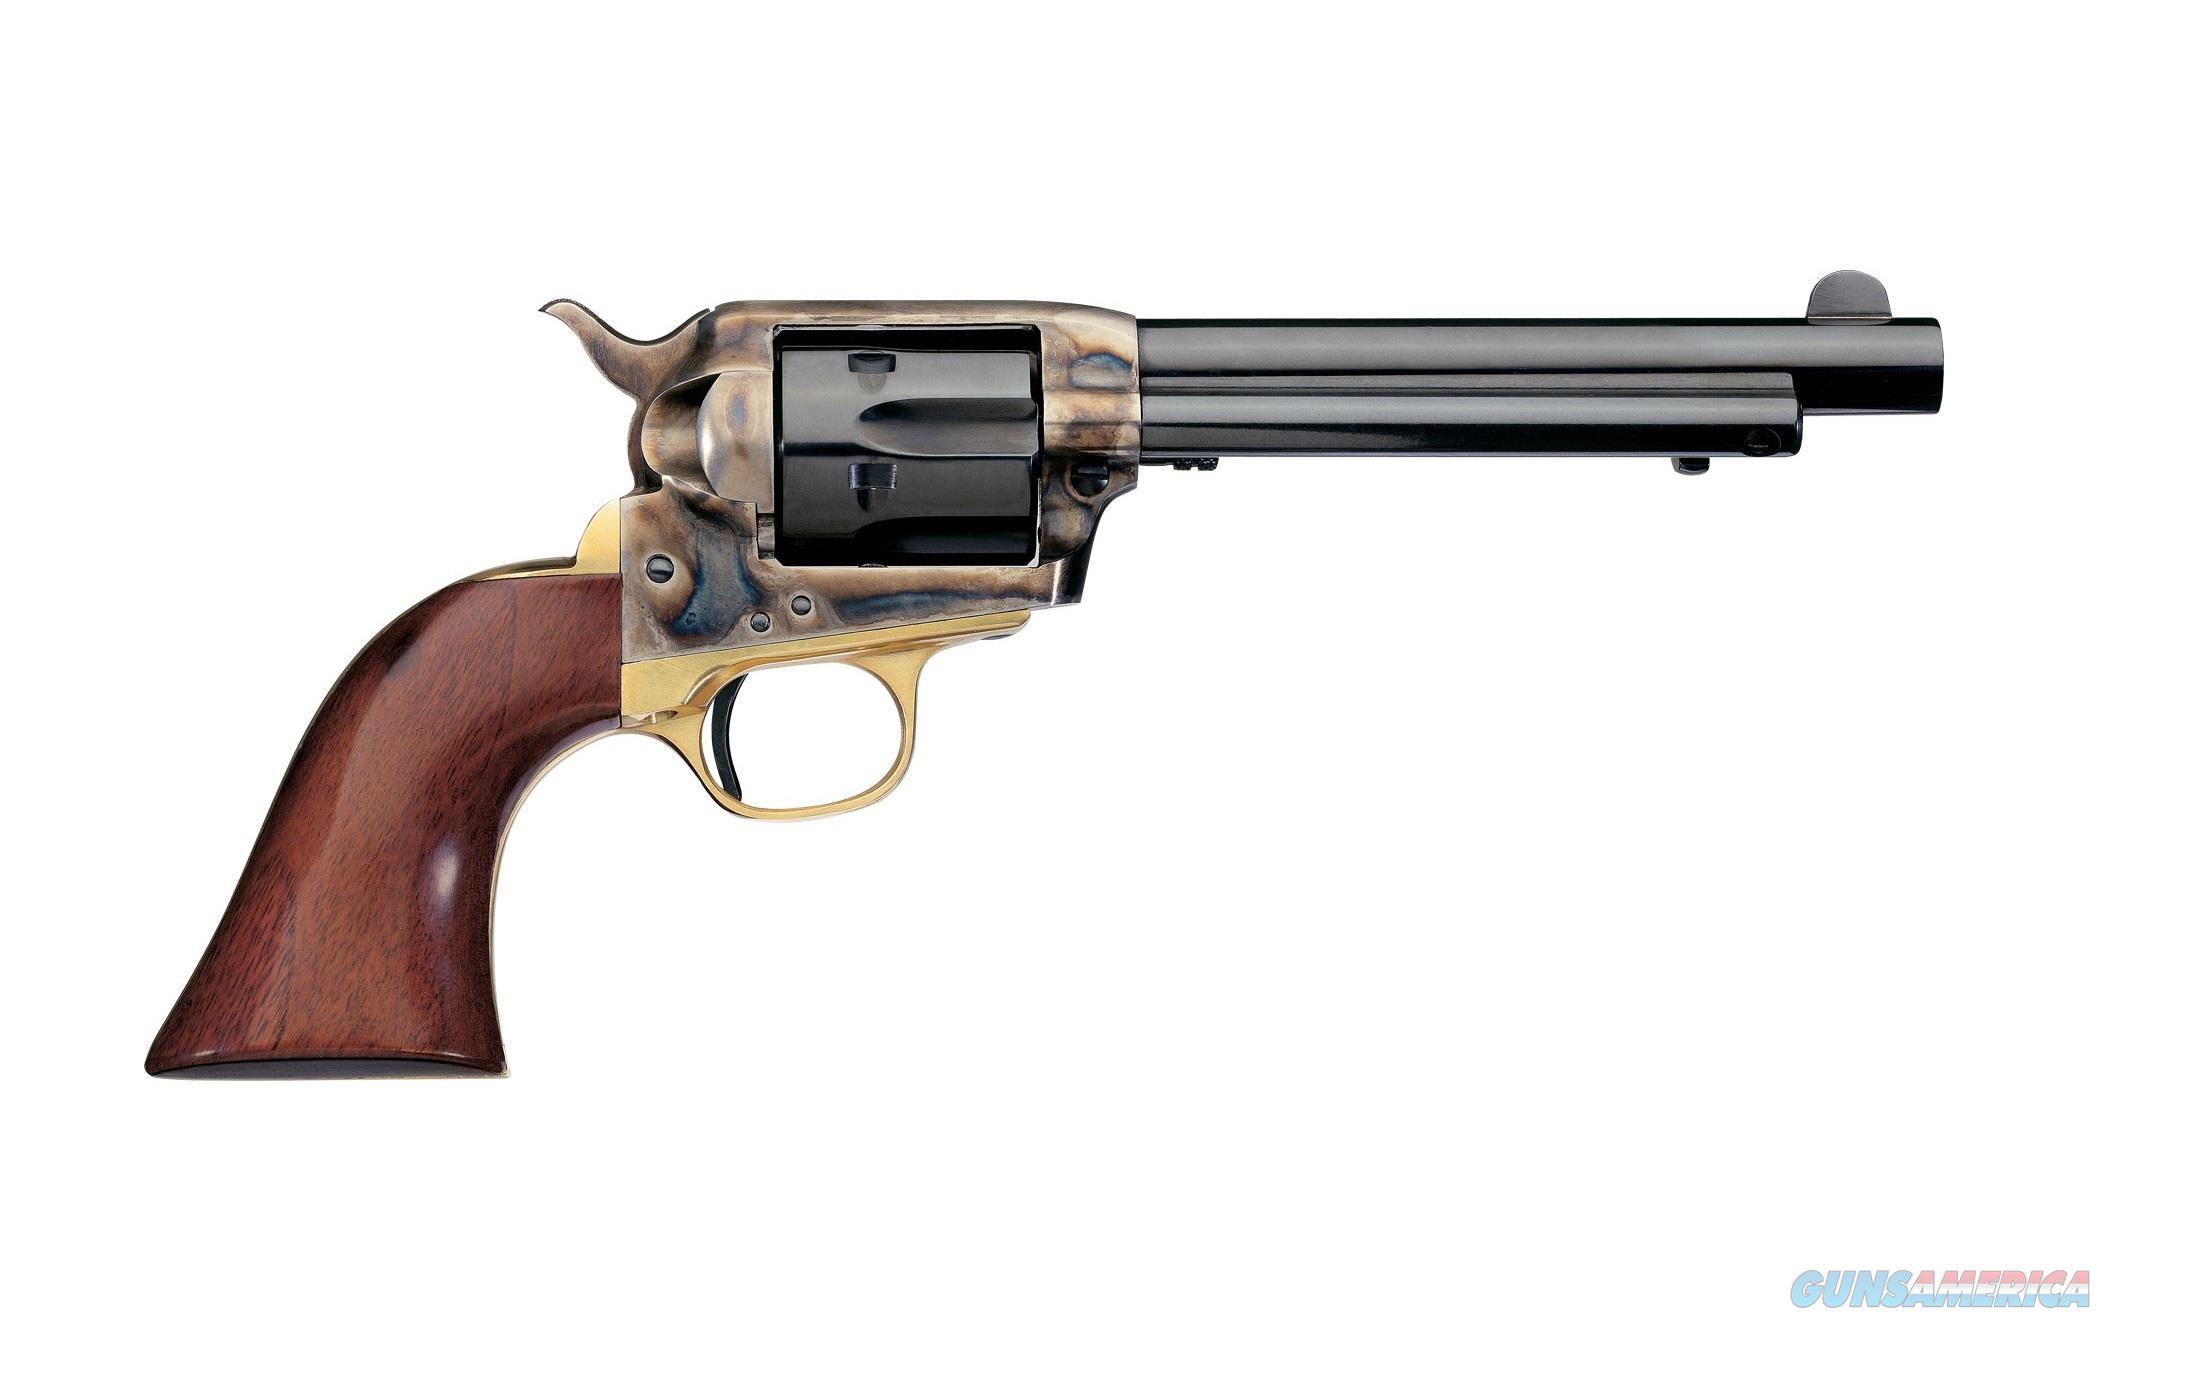 Uberti 1873 Stallion Revolver NM .22LR/.22Mag 349879   Guns > Pistols > Uberti Pistols > Ctg.